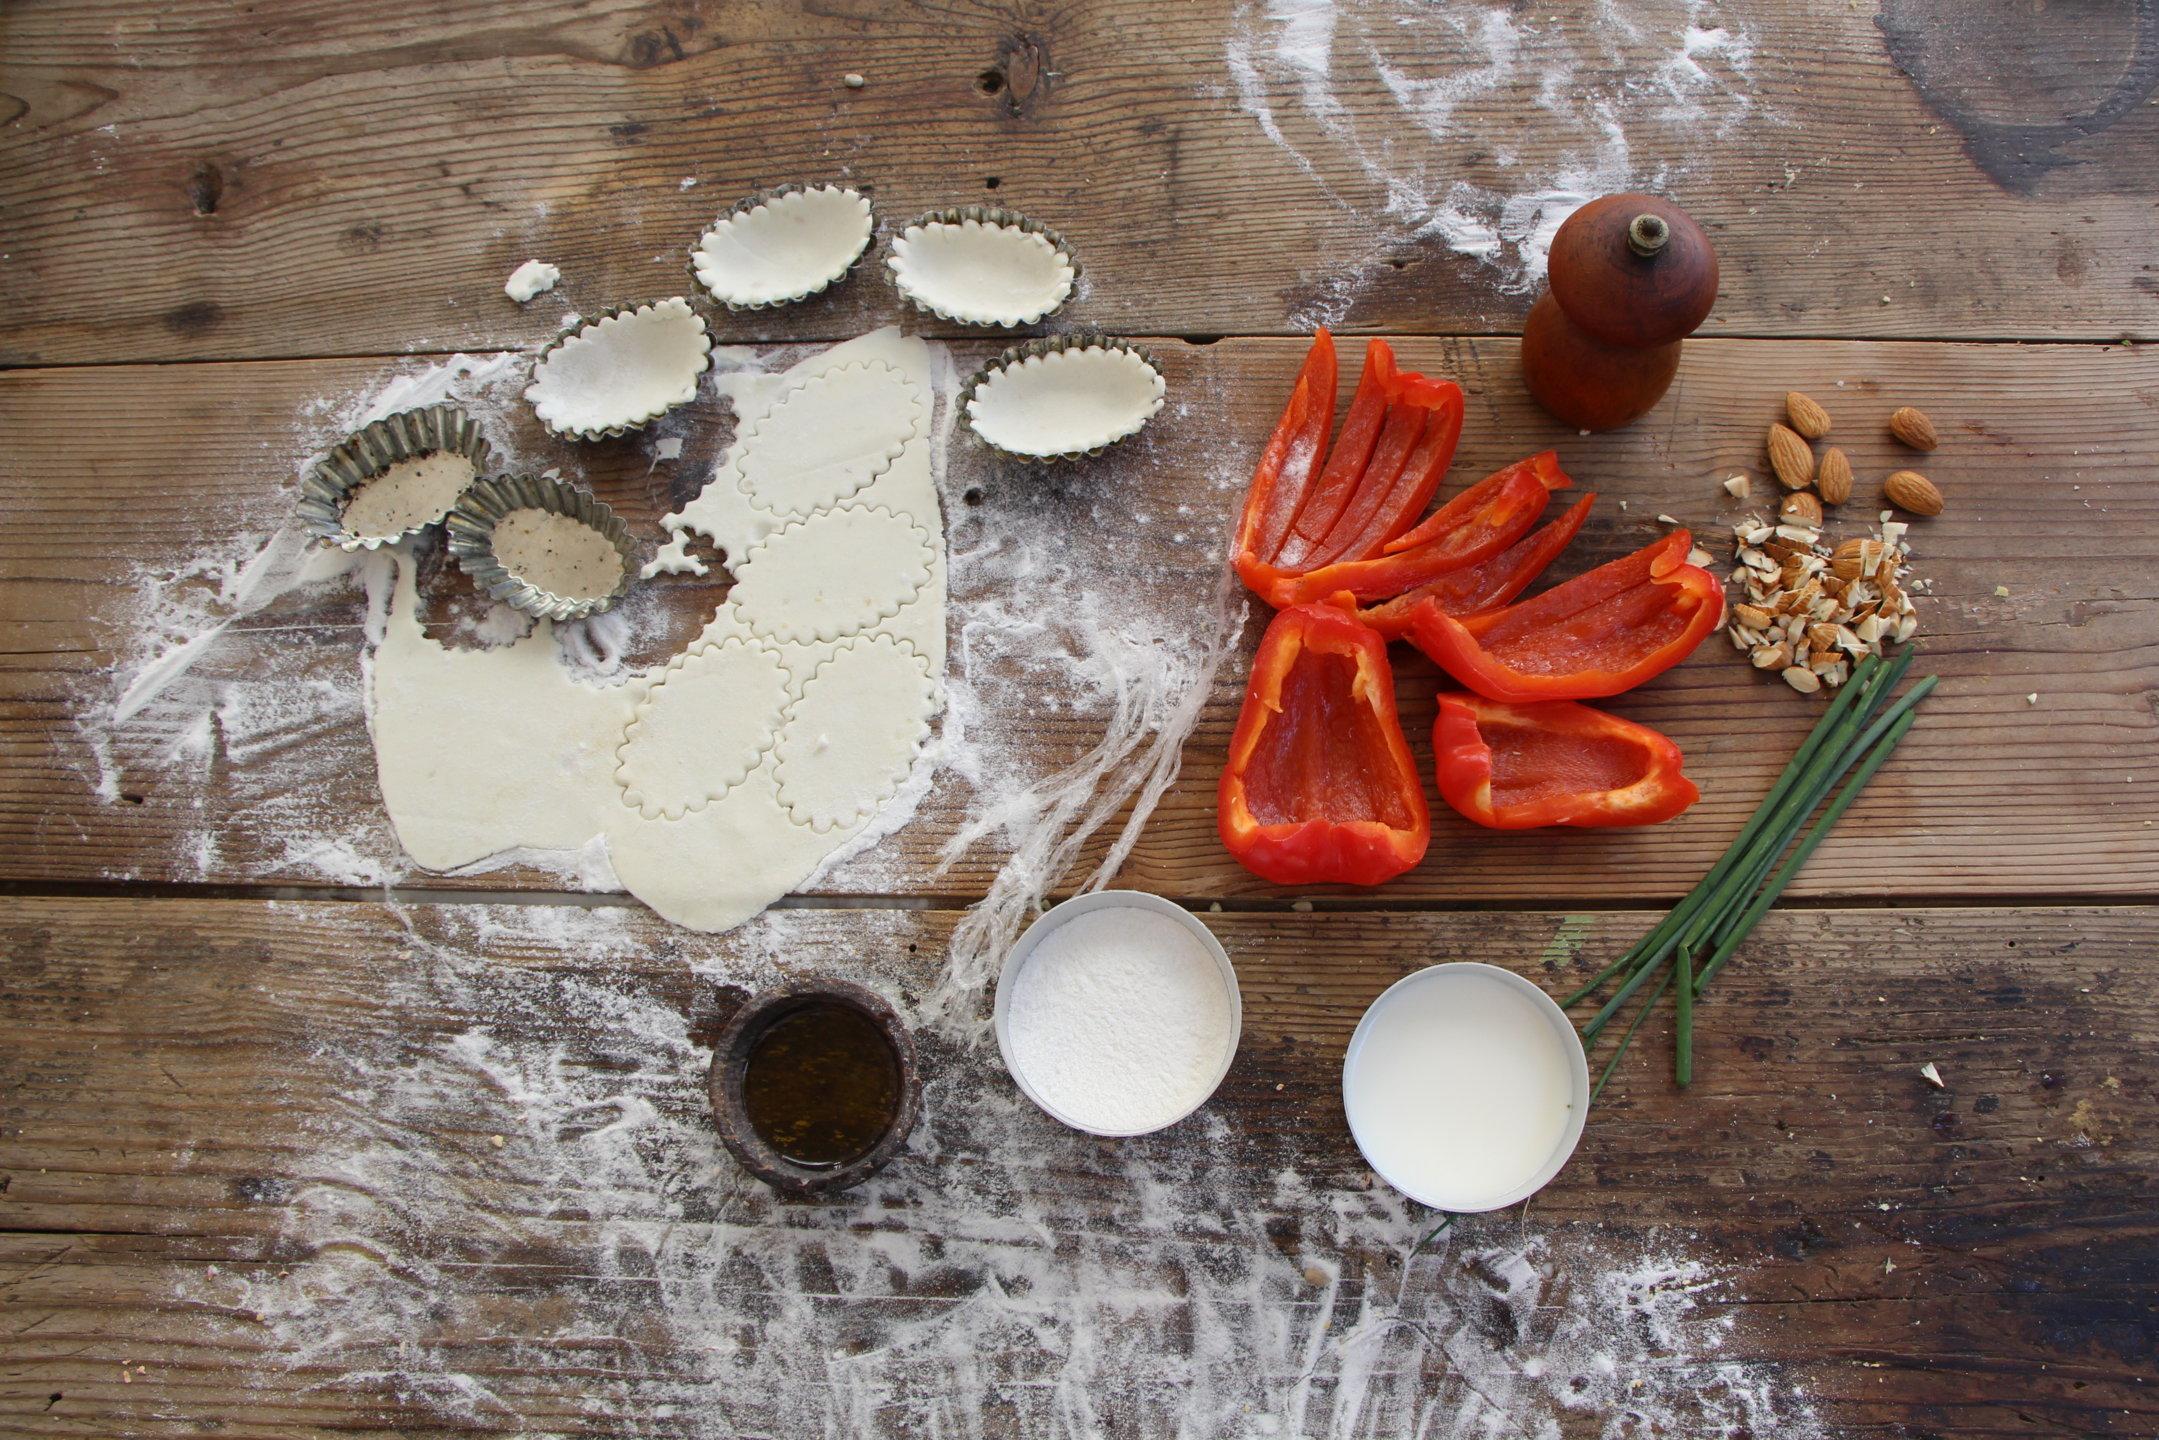 canapé peperoni senza glutine